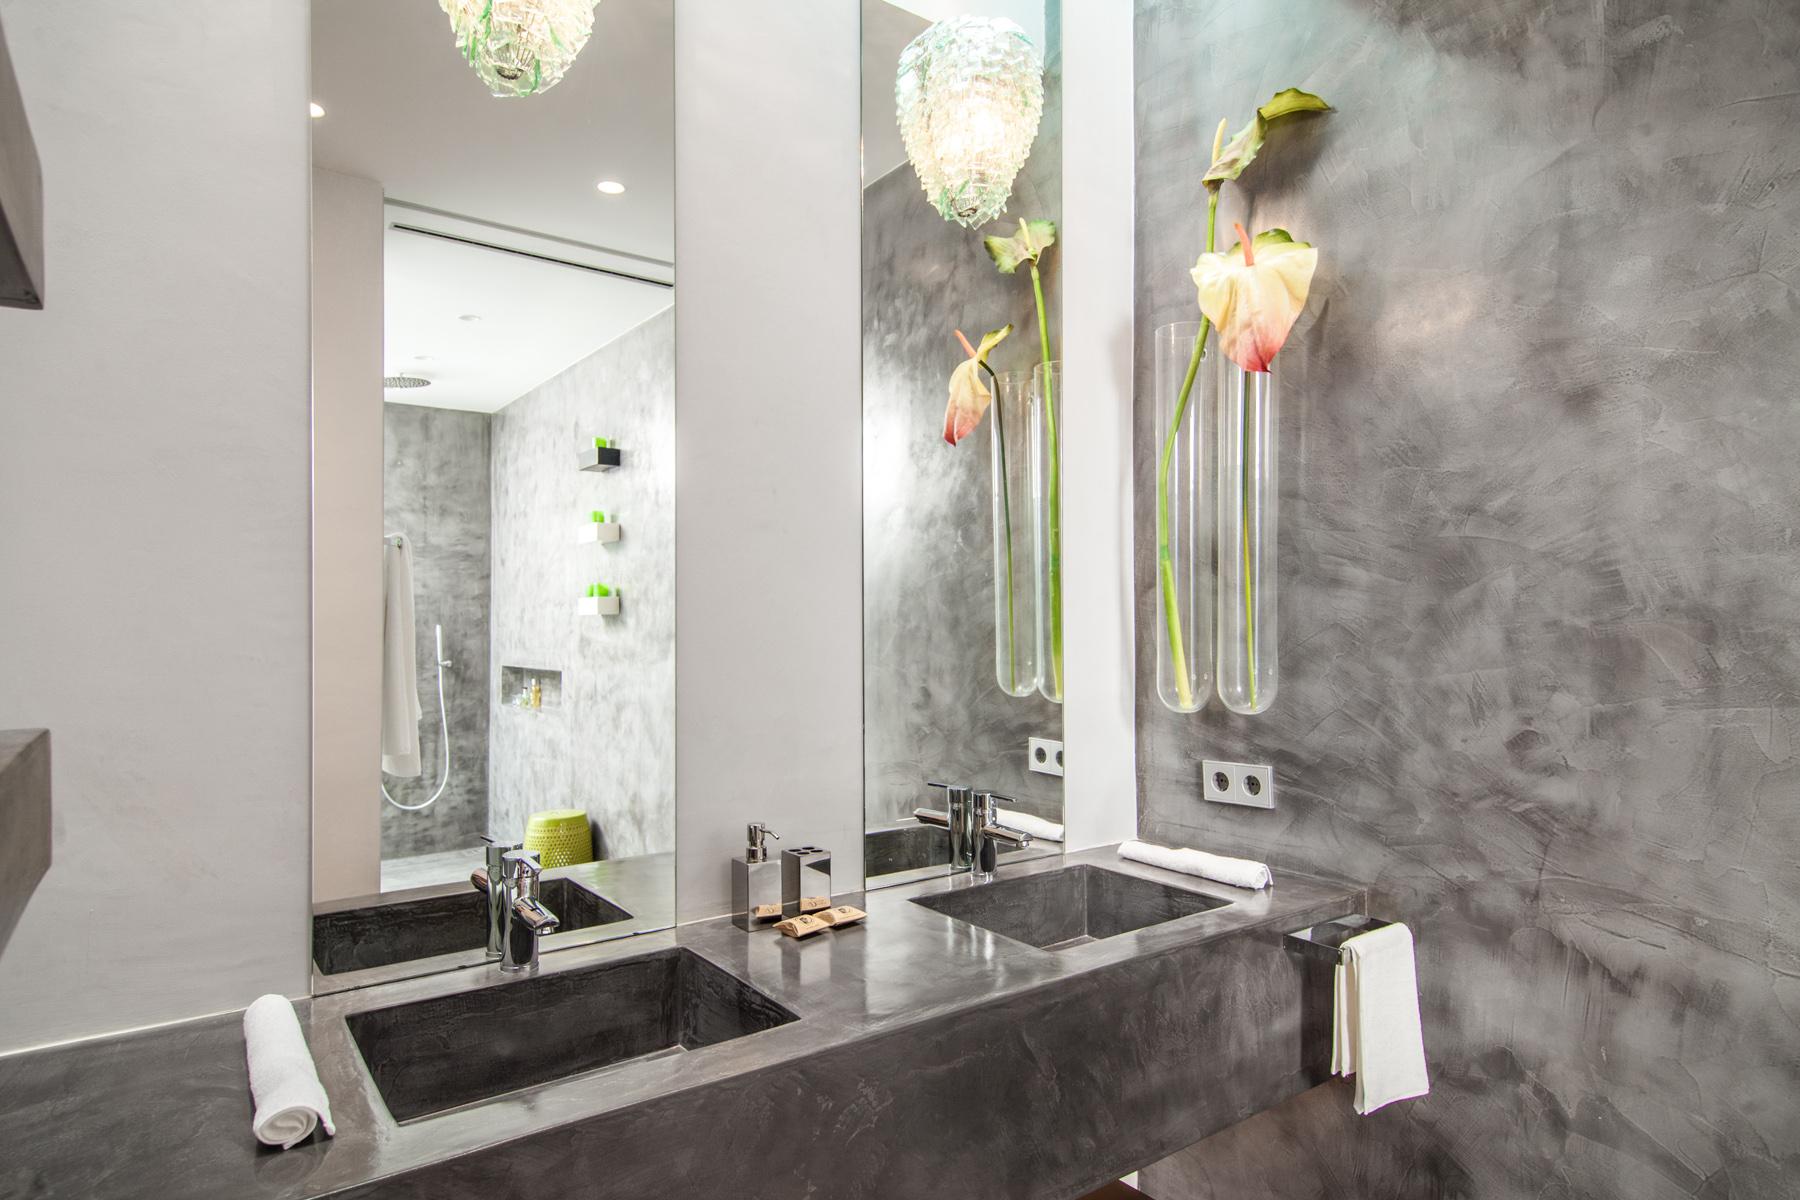 https://www.white-ibiza.com/wp-content/uploads/2020/05/white-ibiza-villas-can-zama-bathroom.jpg